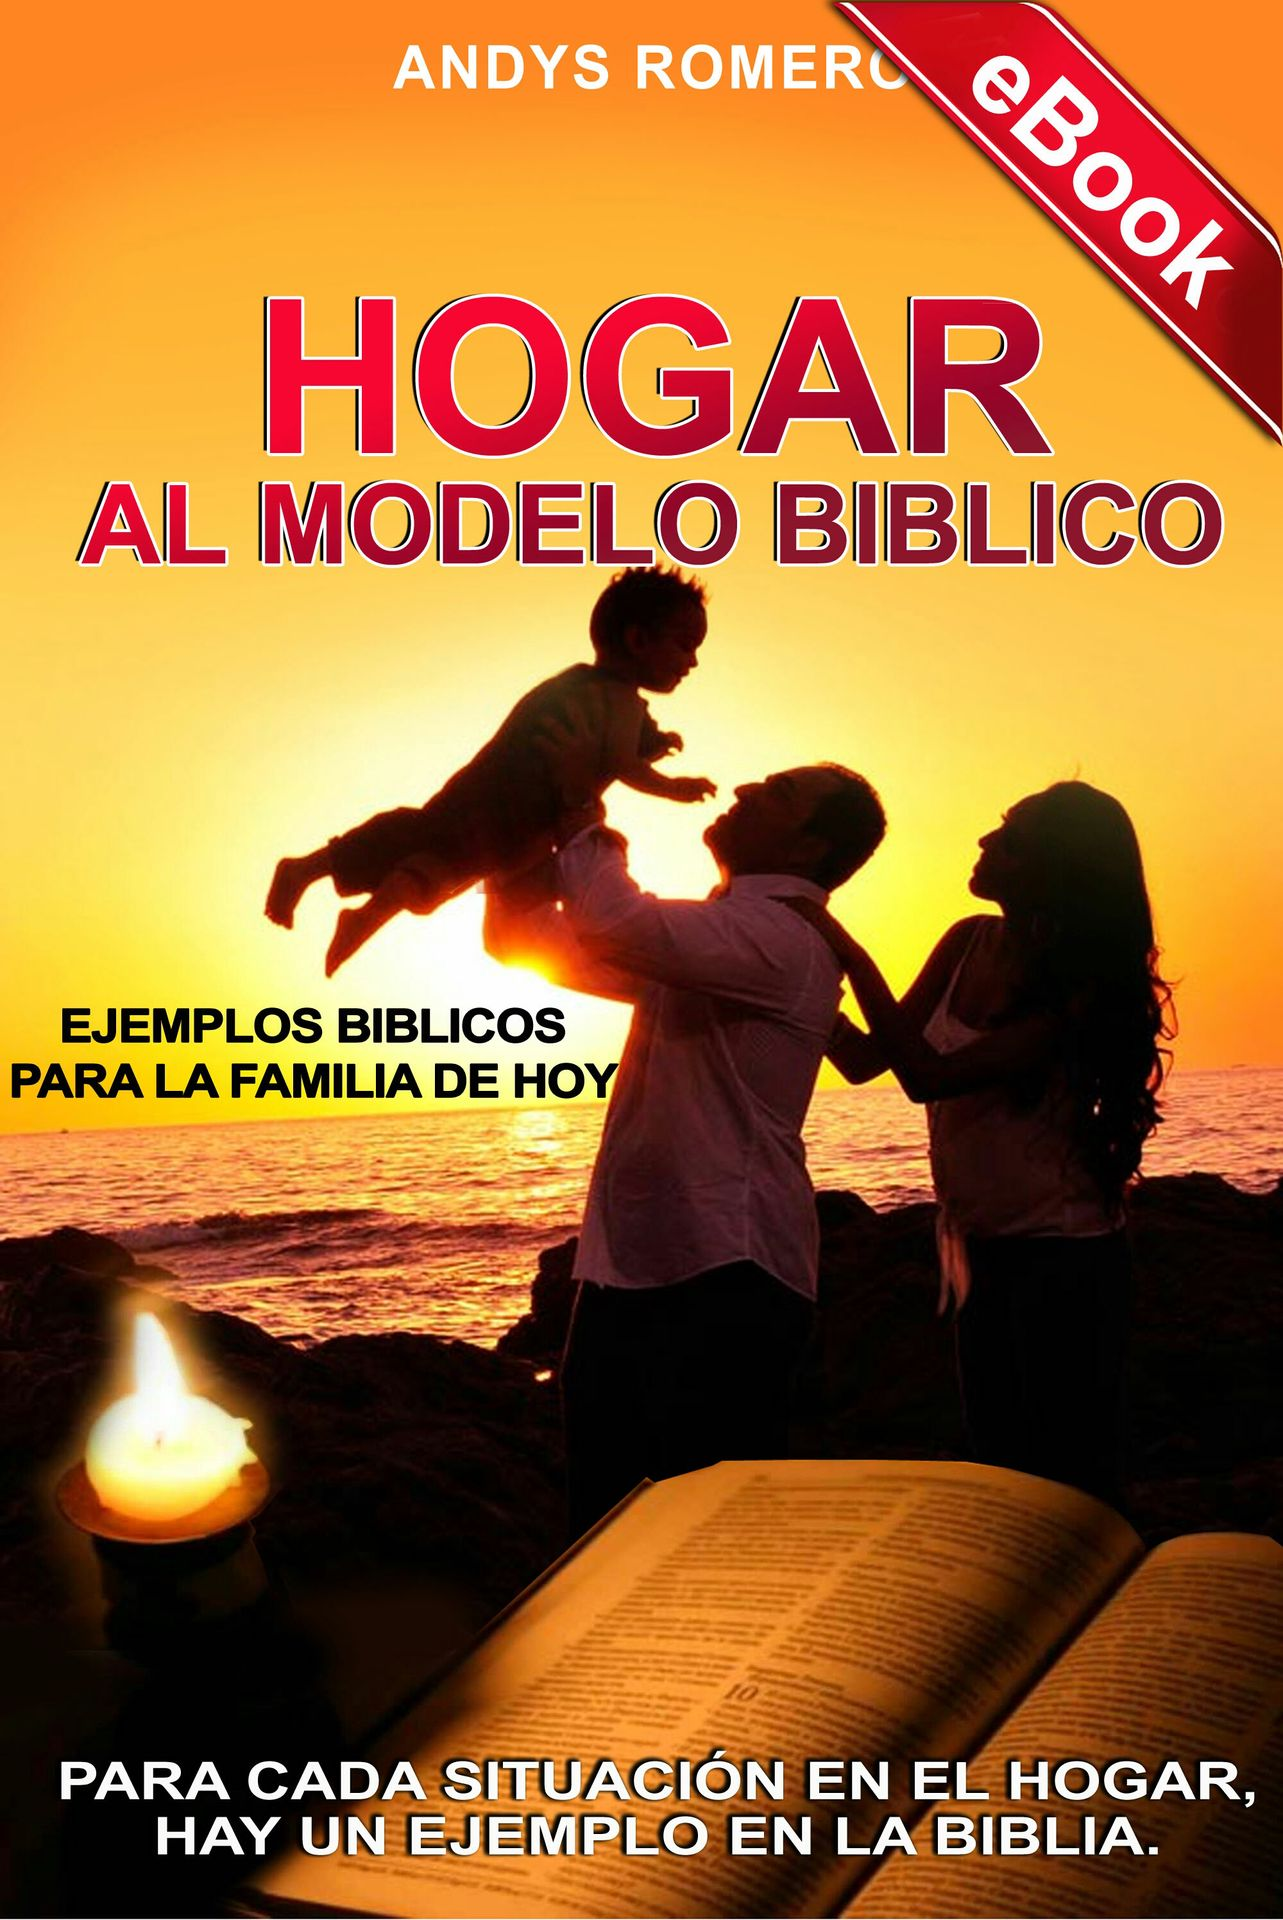 Matrimonios Exitosos Biblia : Hogar al modelo biblico introduccion wattpad